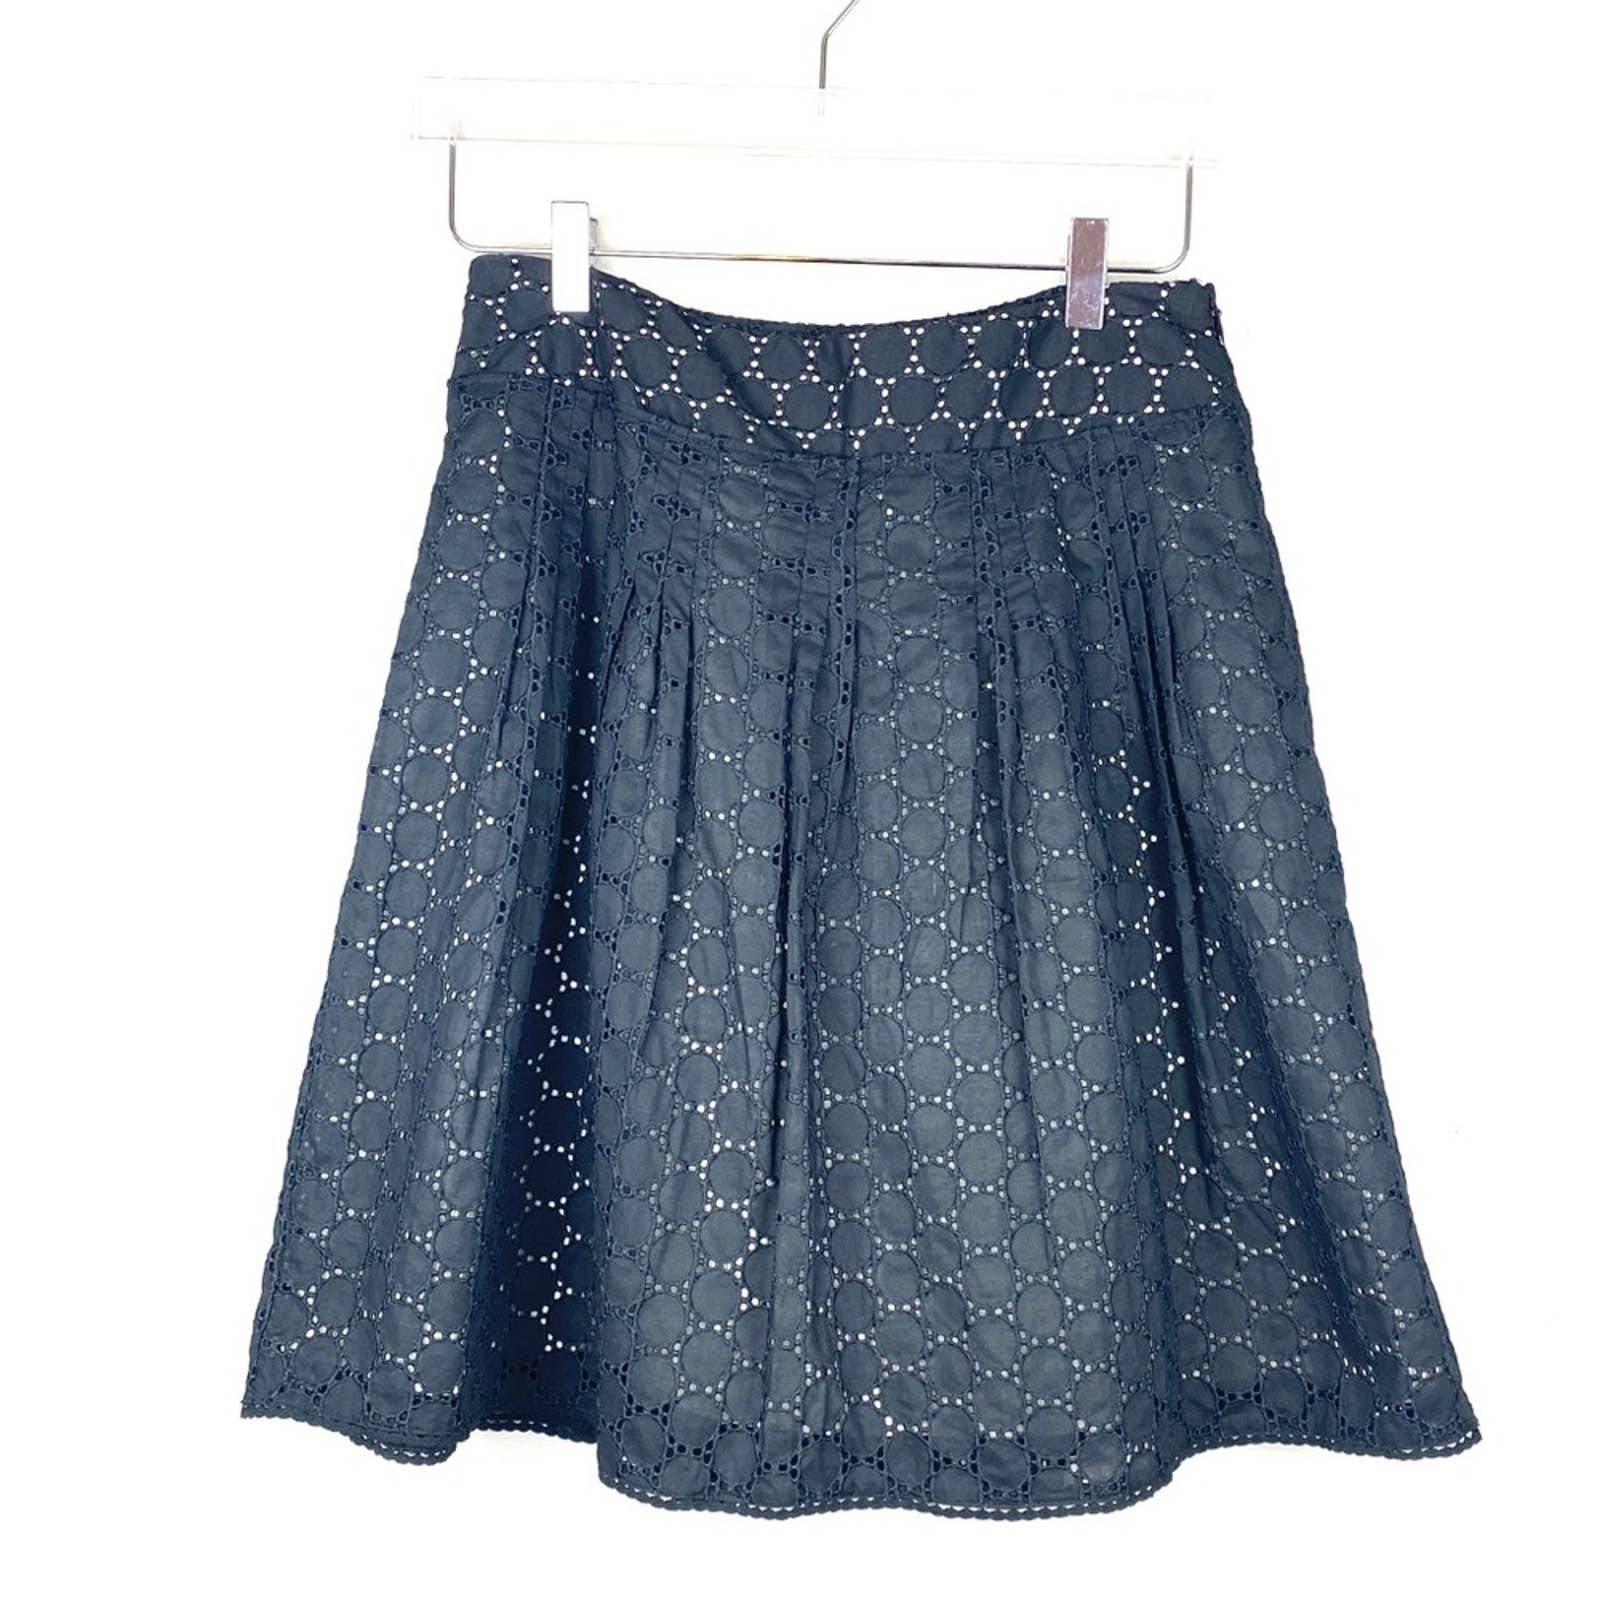 Ann Taylor Petite Eyelet Black Skirt